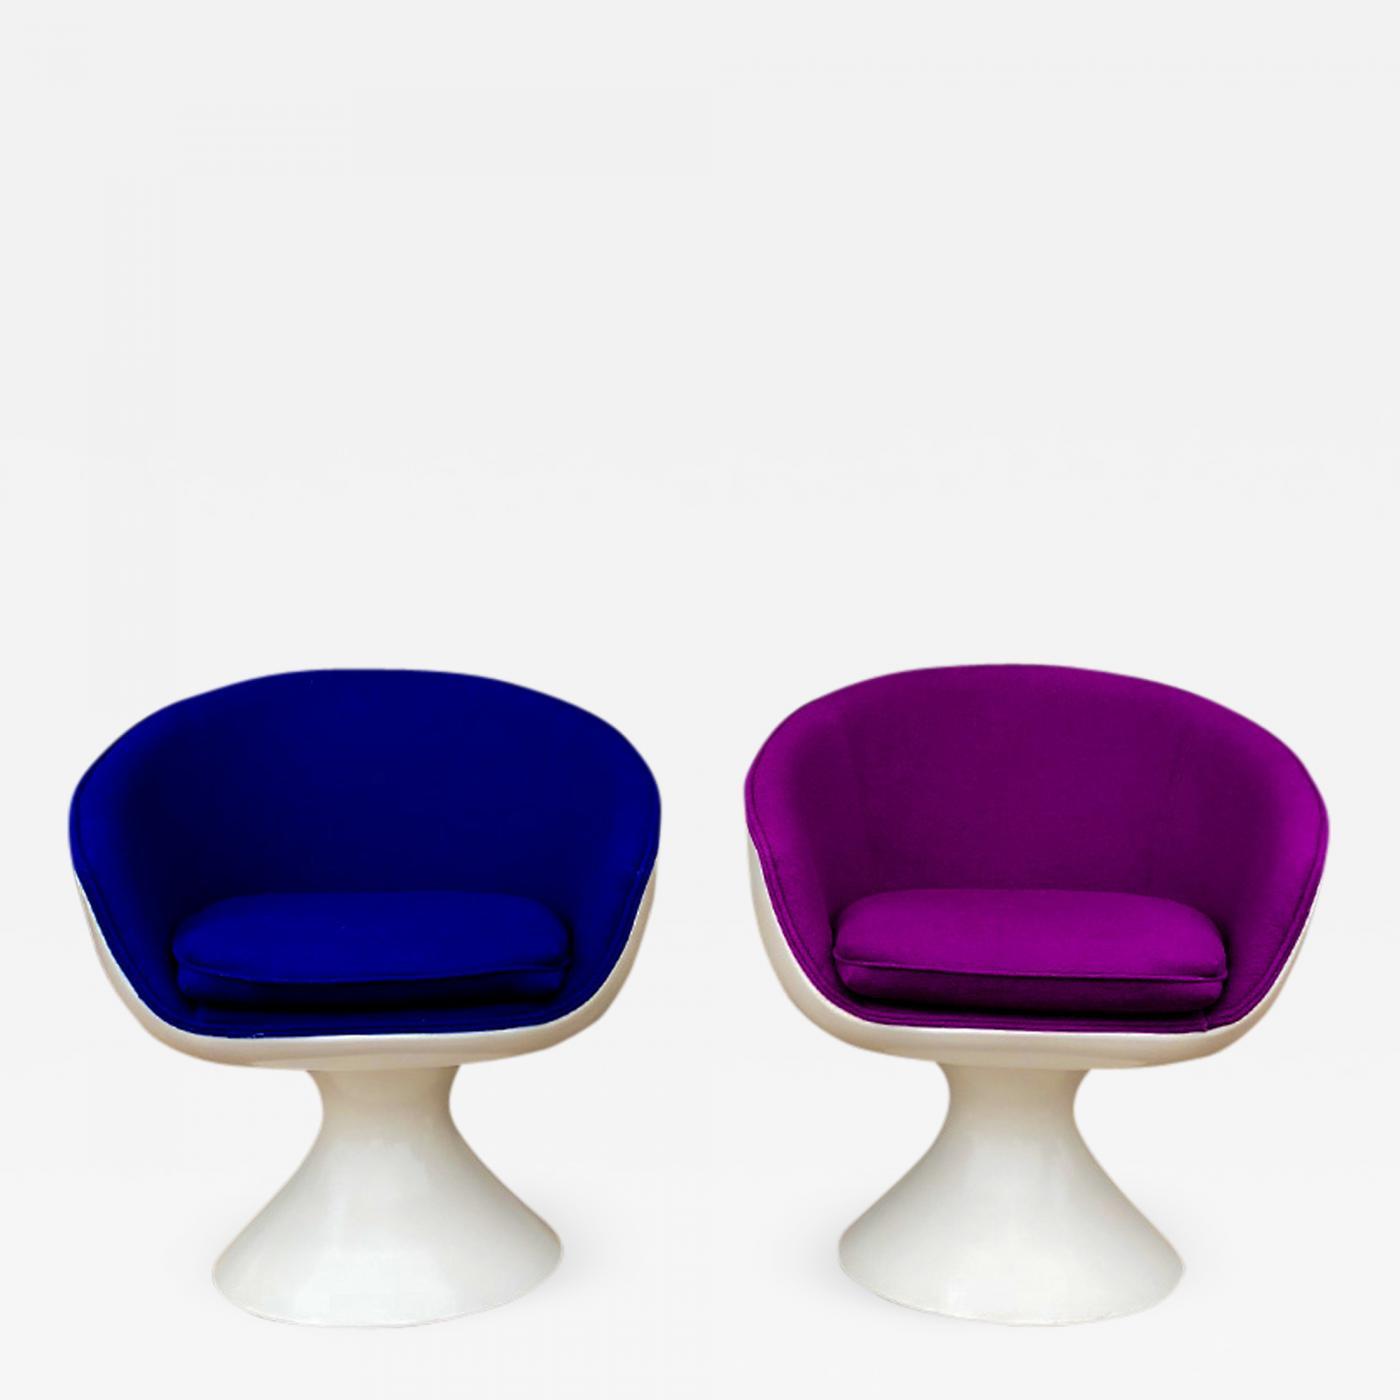 Fantastic Chromcraft Chromcraft Fiberglass Swivel Chairs Cjindustries Chair Design For Home Cjindustriesco